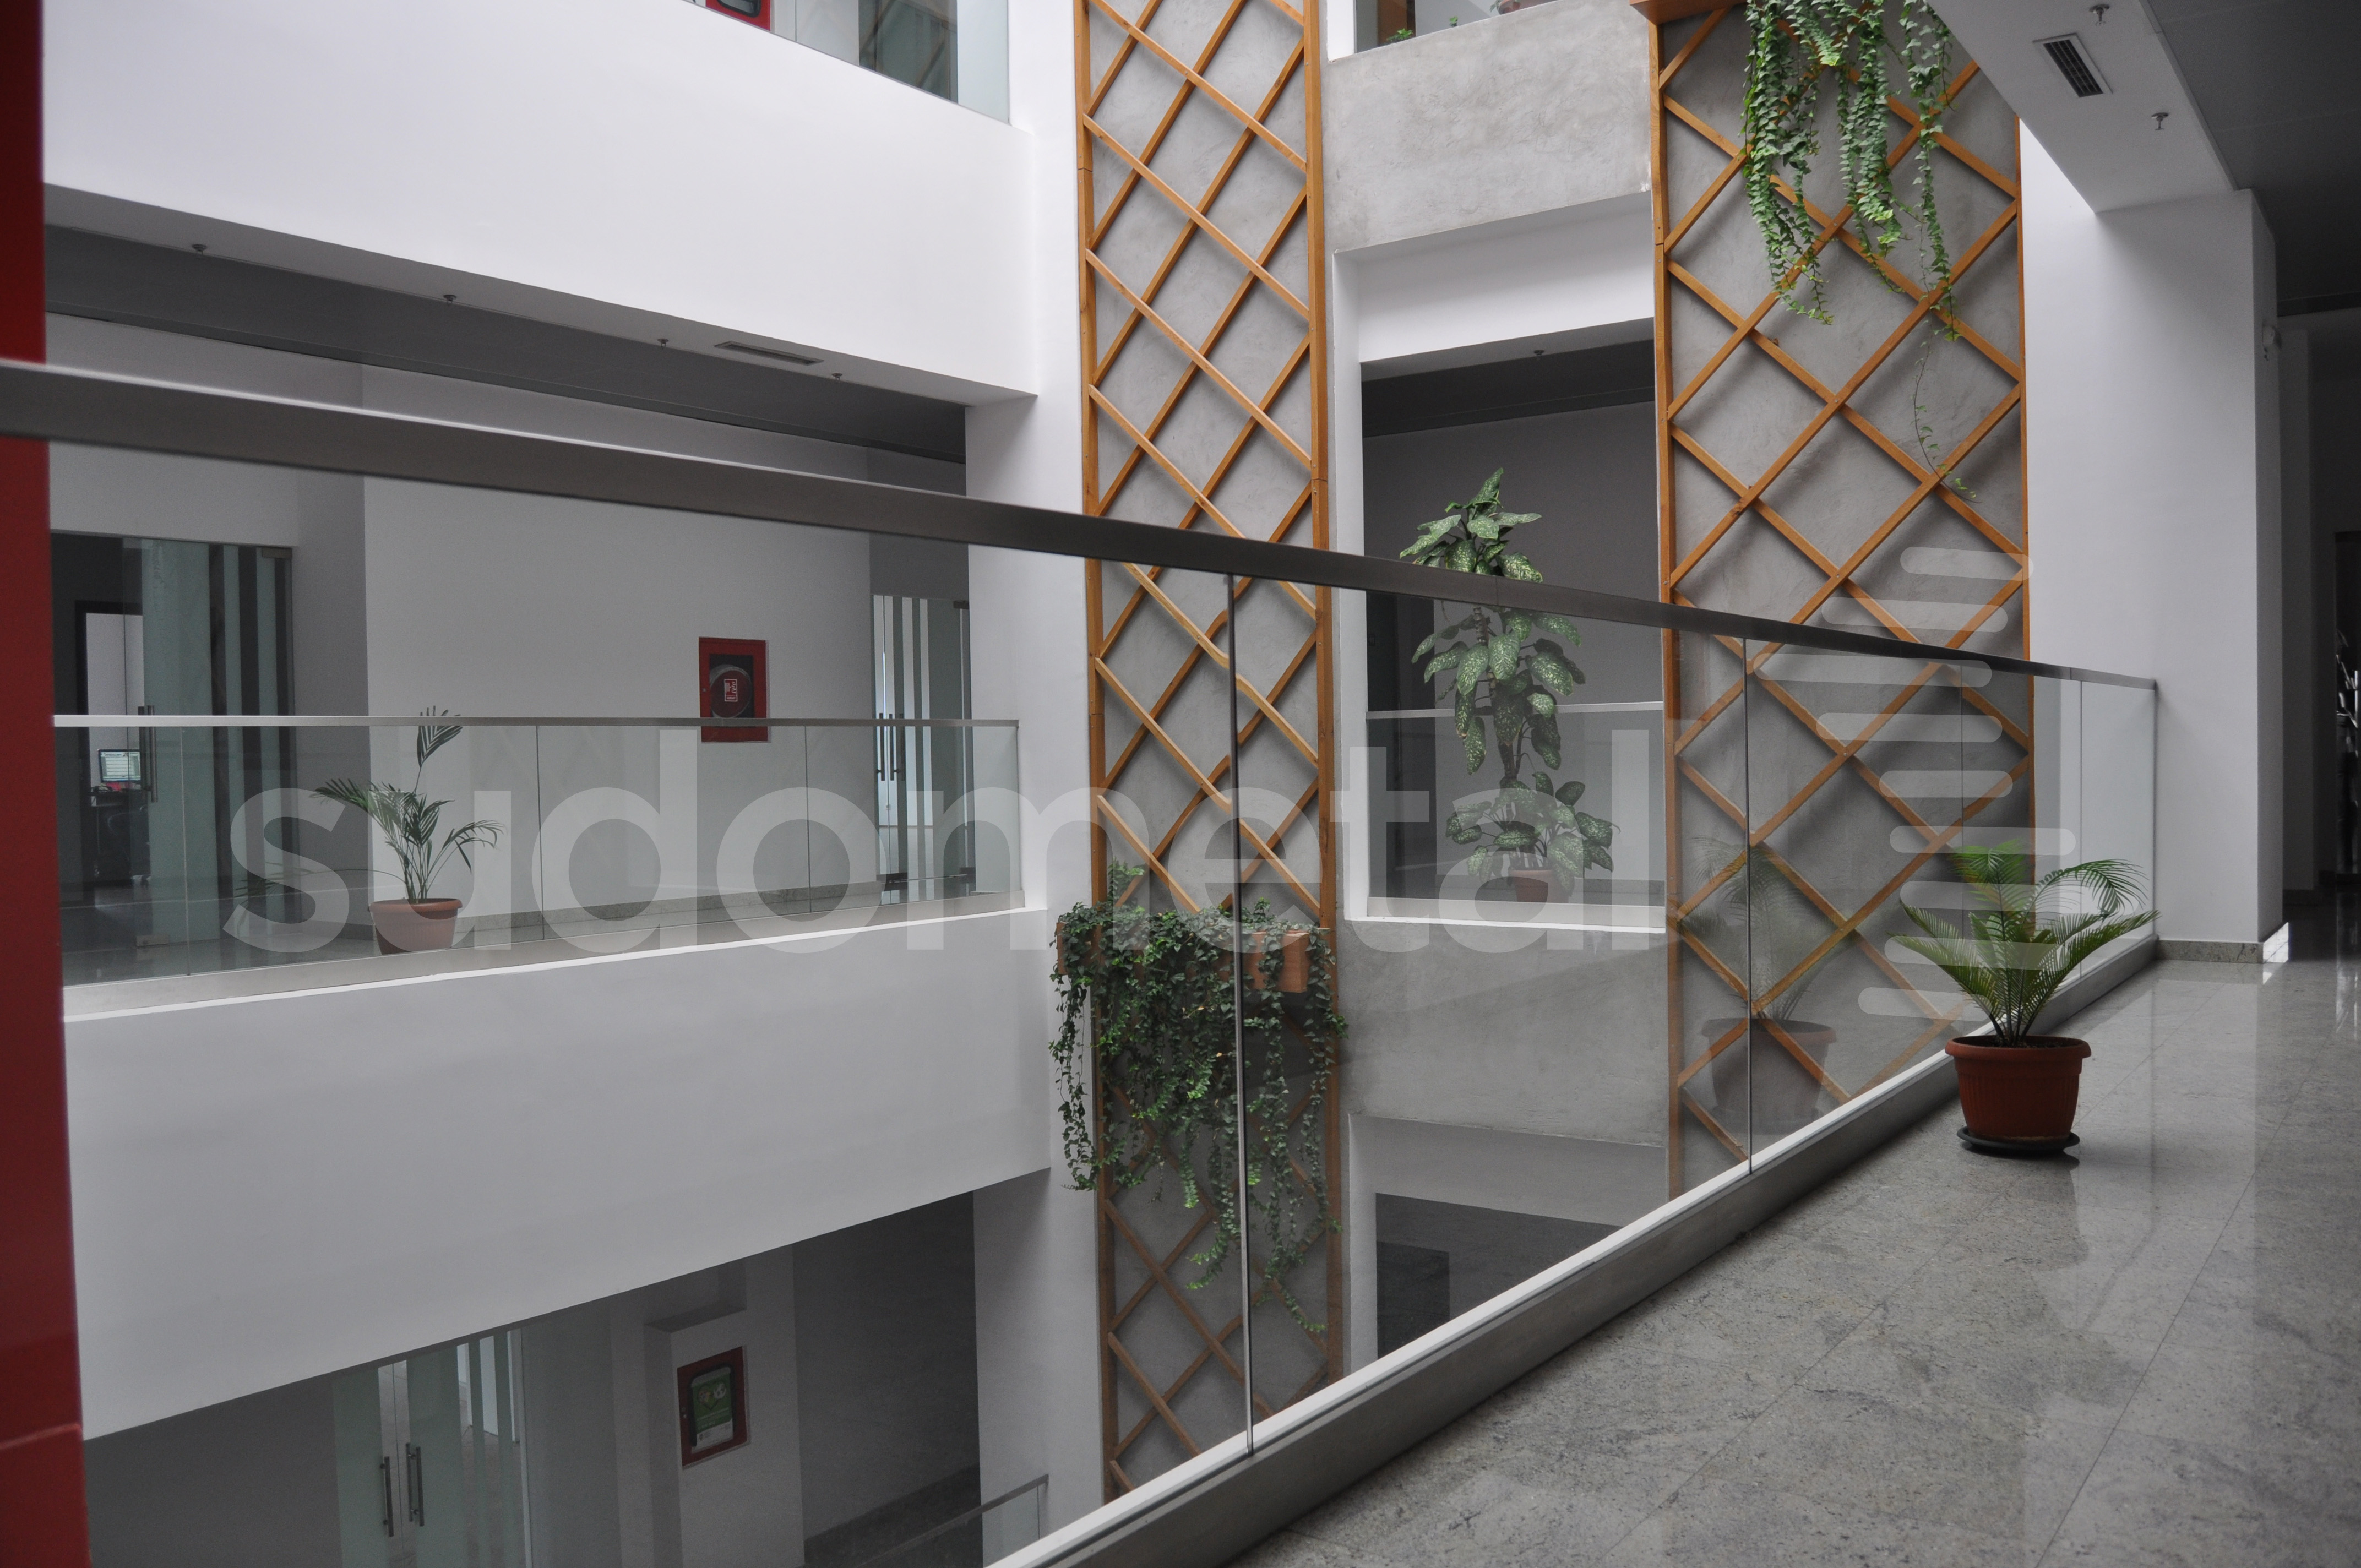 Balustrade din sticla - Balustrada cladire de birouri 30 Avenue, Bacau SUDOMETAL - Poza 2